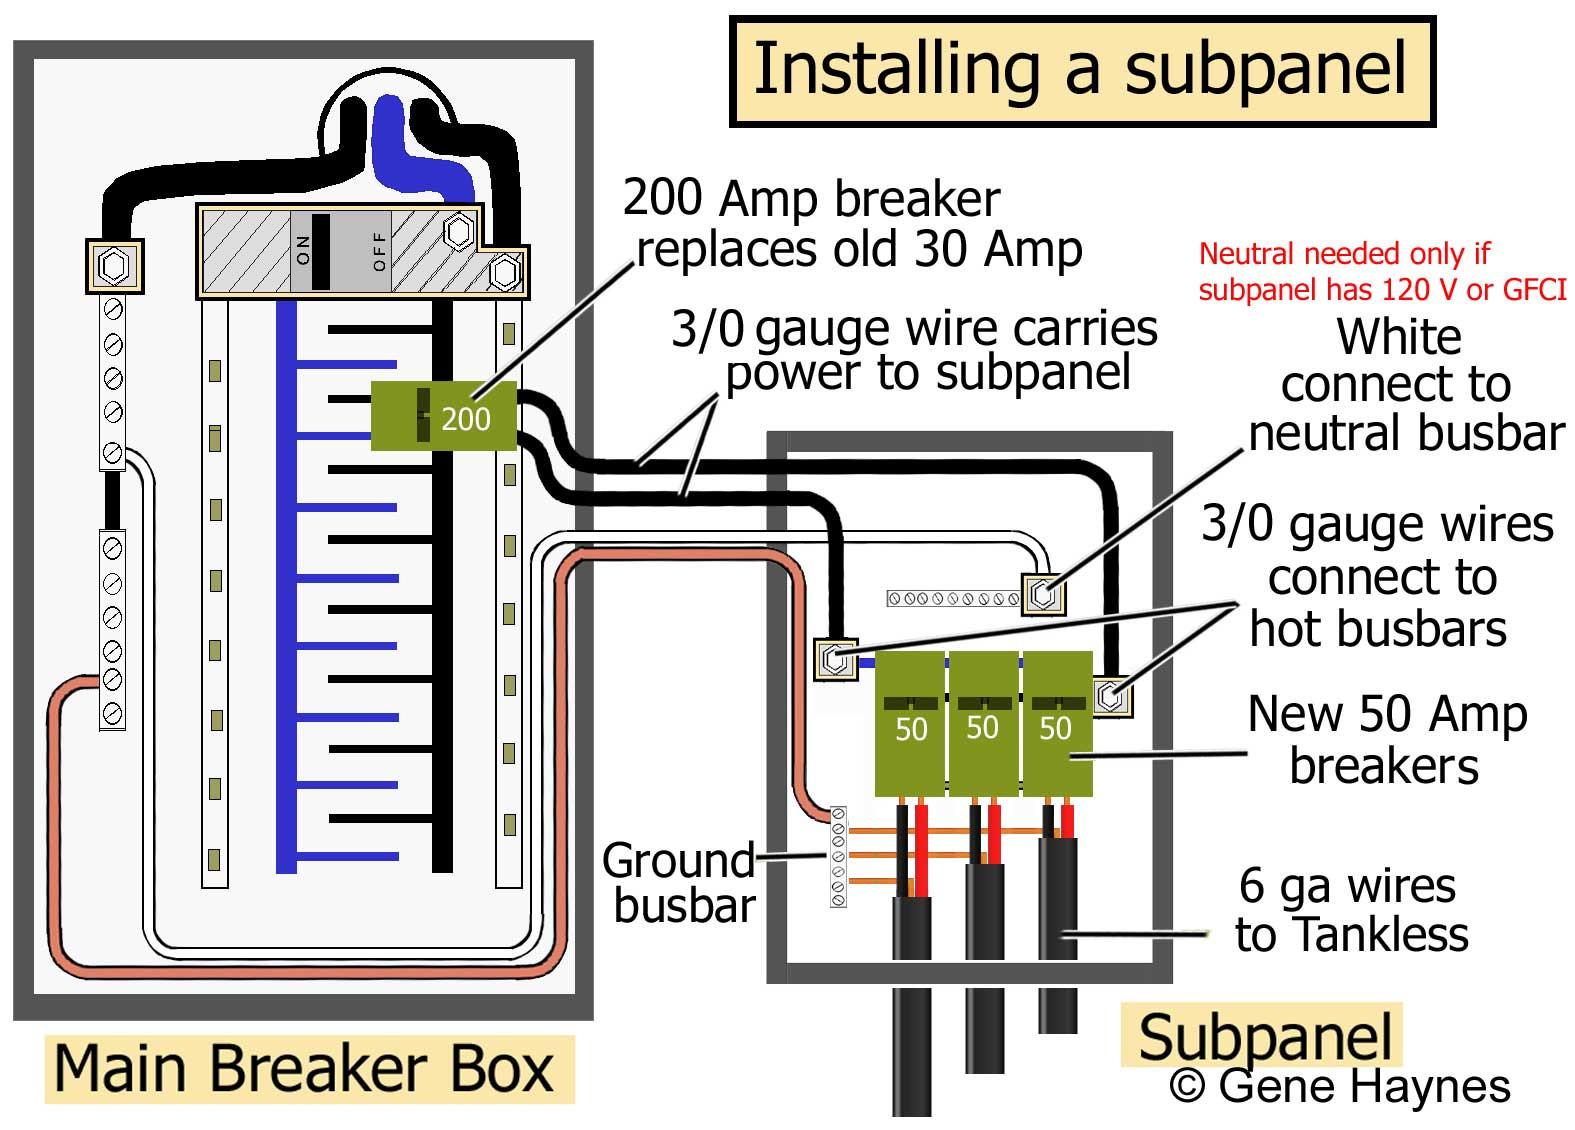 Diagram Of 100 Amp Breaker Box Wiring | Wiring Diagram - 200 Amp Breaker Box Wiring Diagram